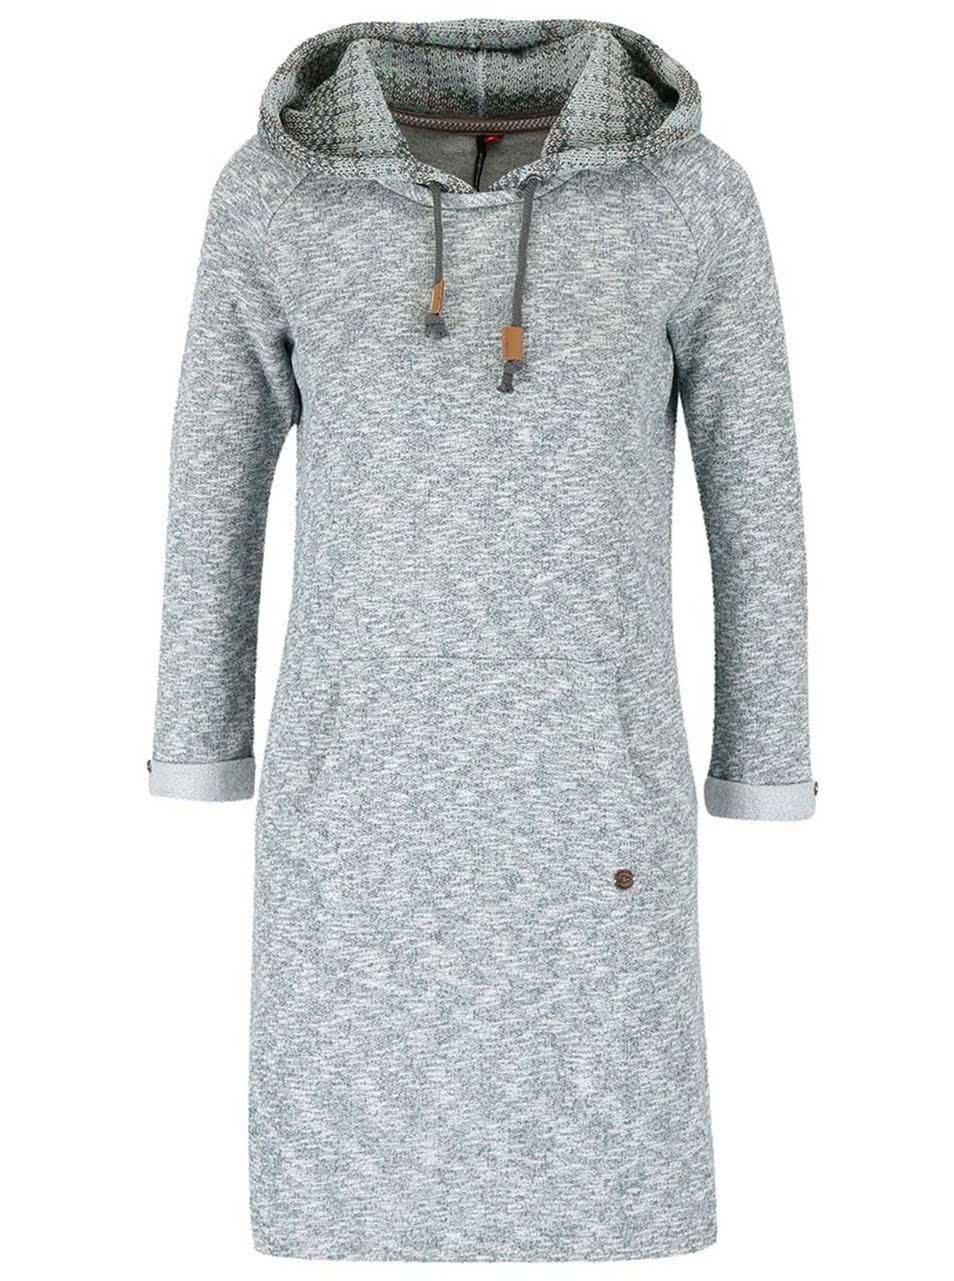 Tyrkysové melírované mikinové šaty s pletenou kapucňou Ragwear Bess ... 10426feead